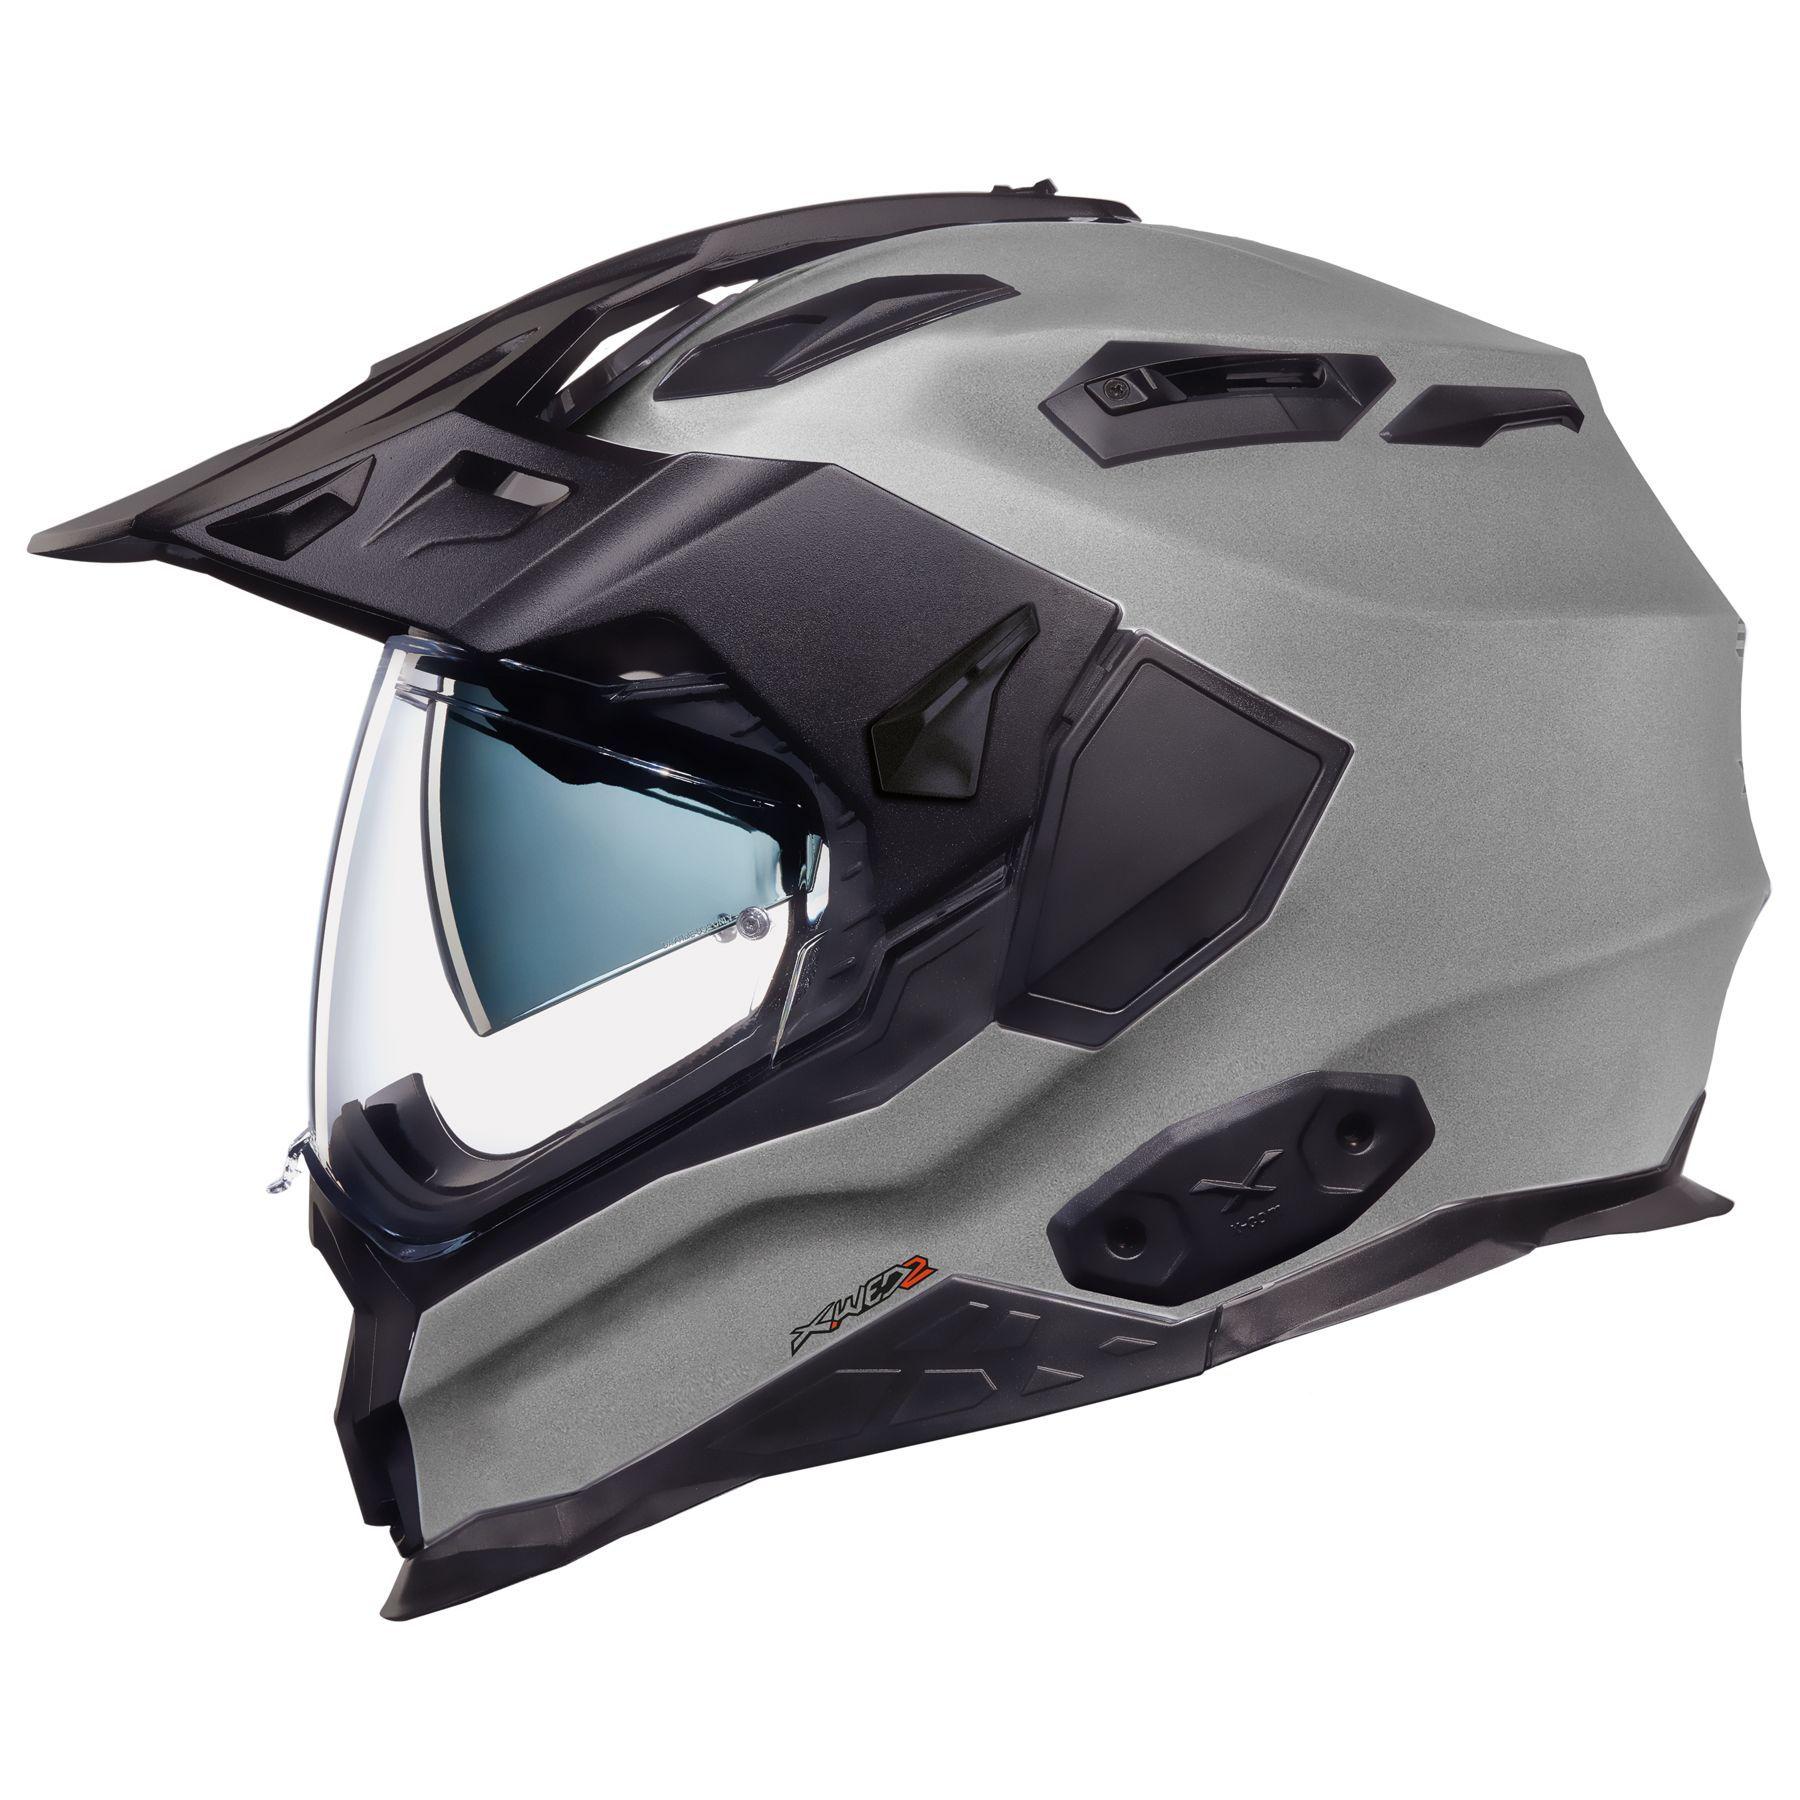 Nexx X.WED2 Purist Helmet in 2020 Helmet, Dual sport